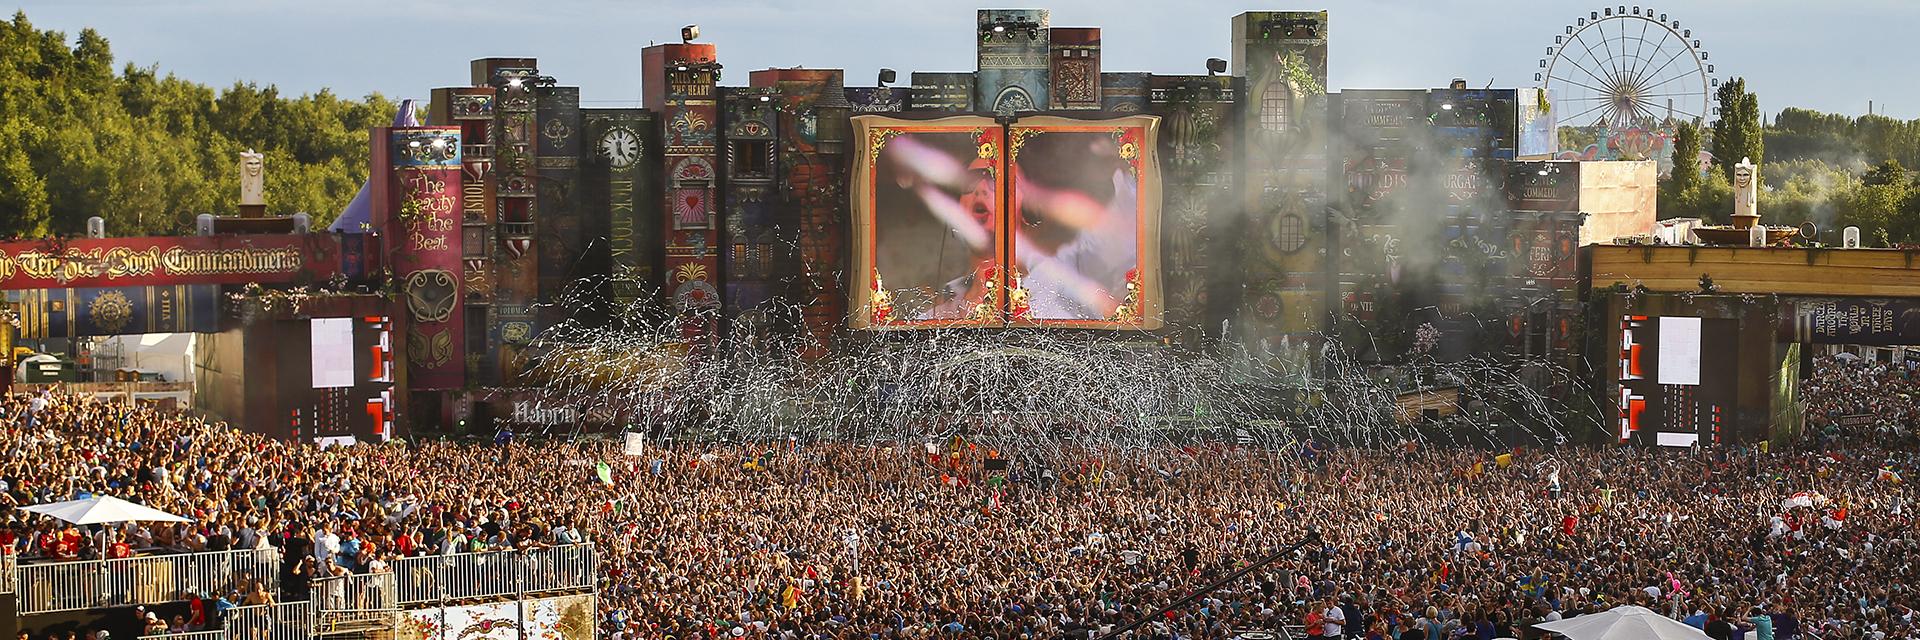 - Tomorrowland